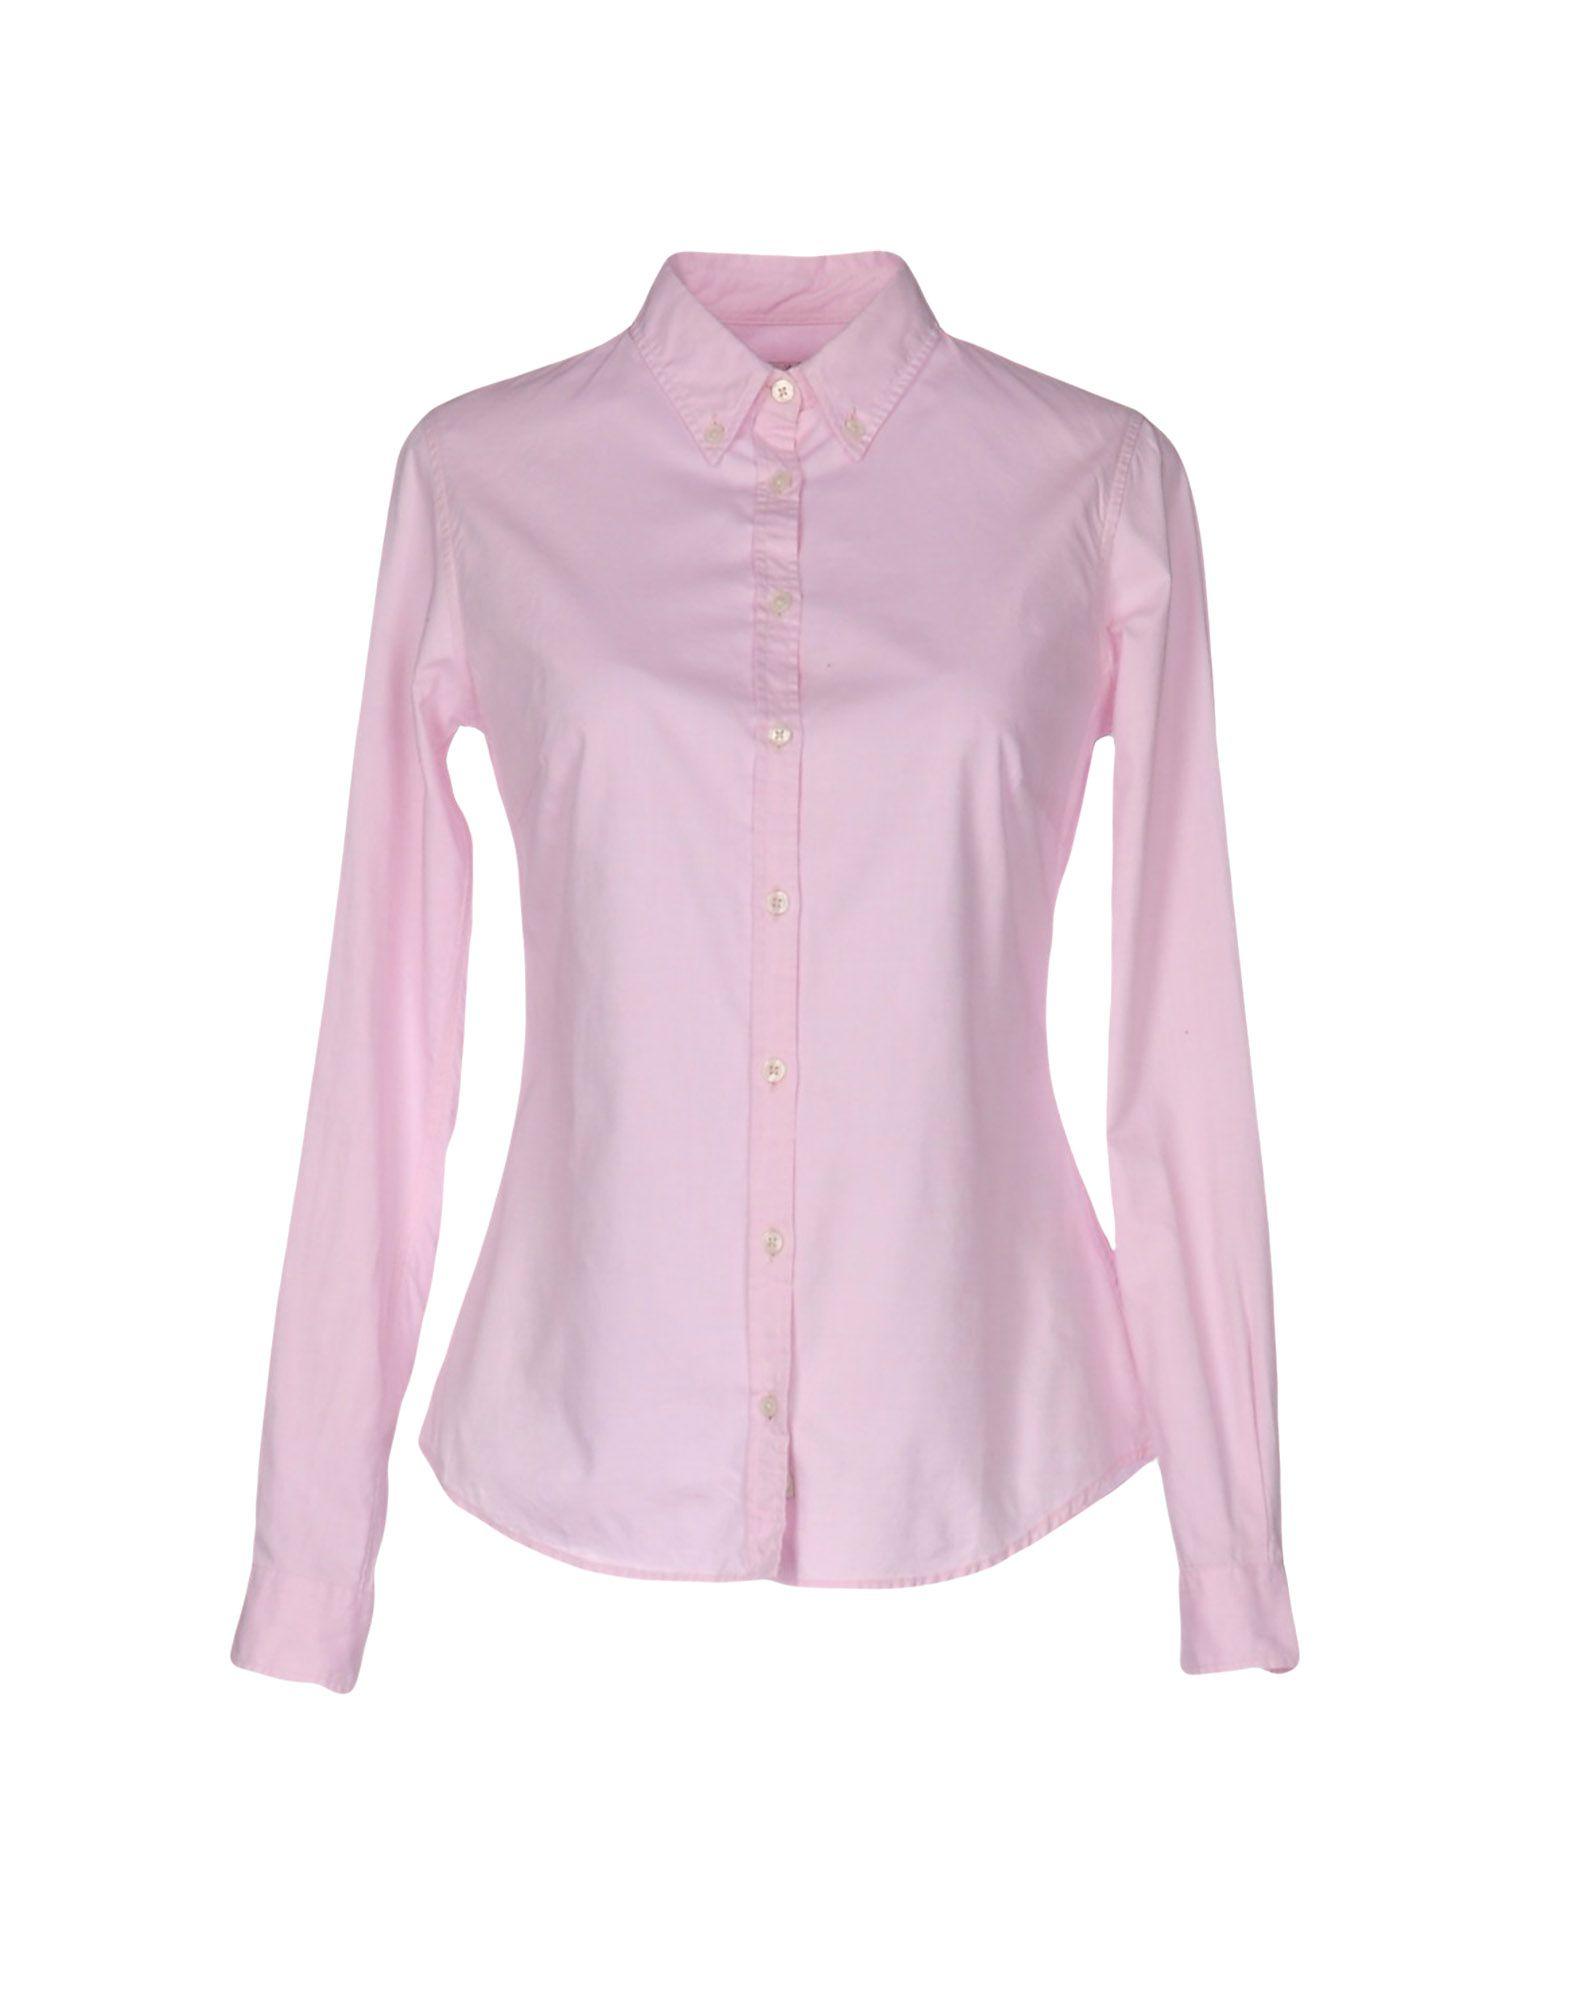 Camicie E Bluse Tinta Unita B.D.Baggies Donna - Acquista online su AoN0v10v9